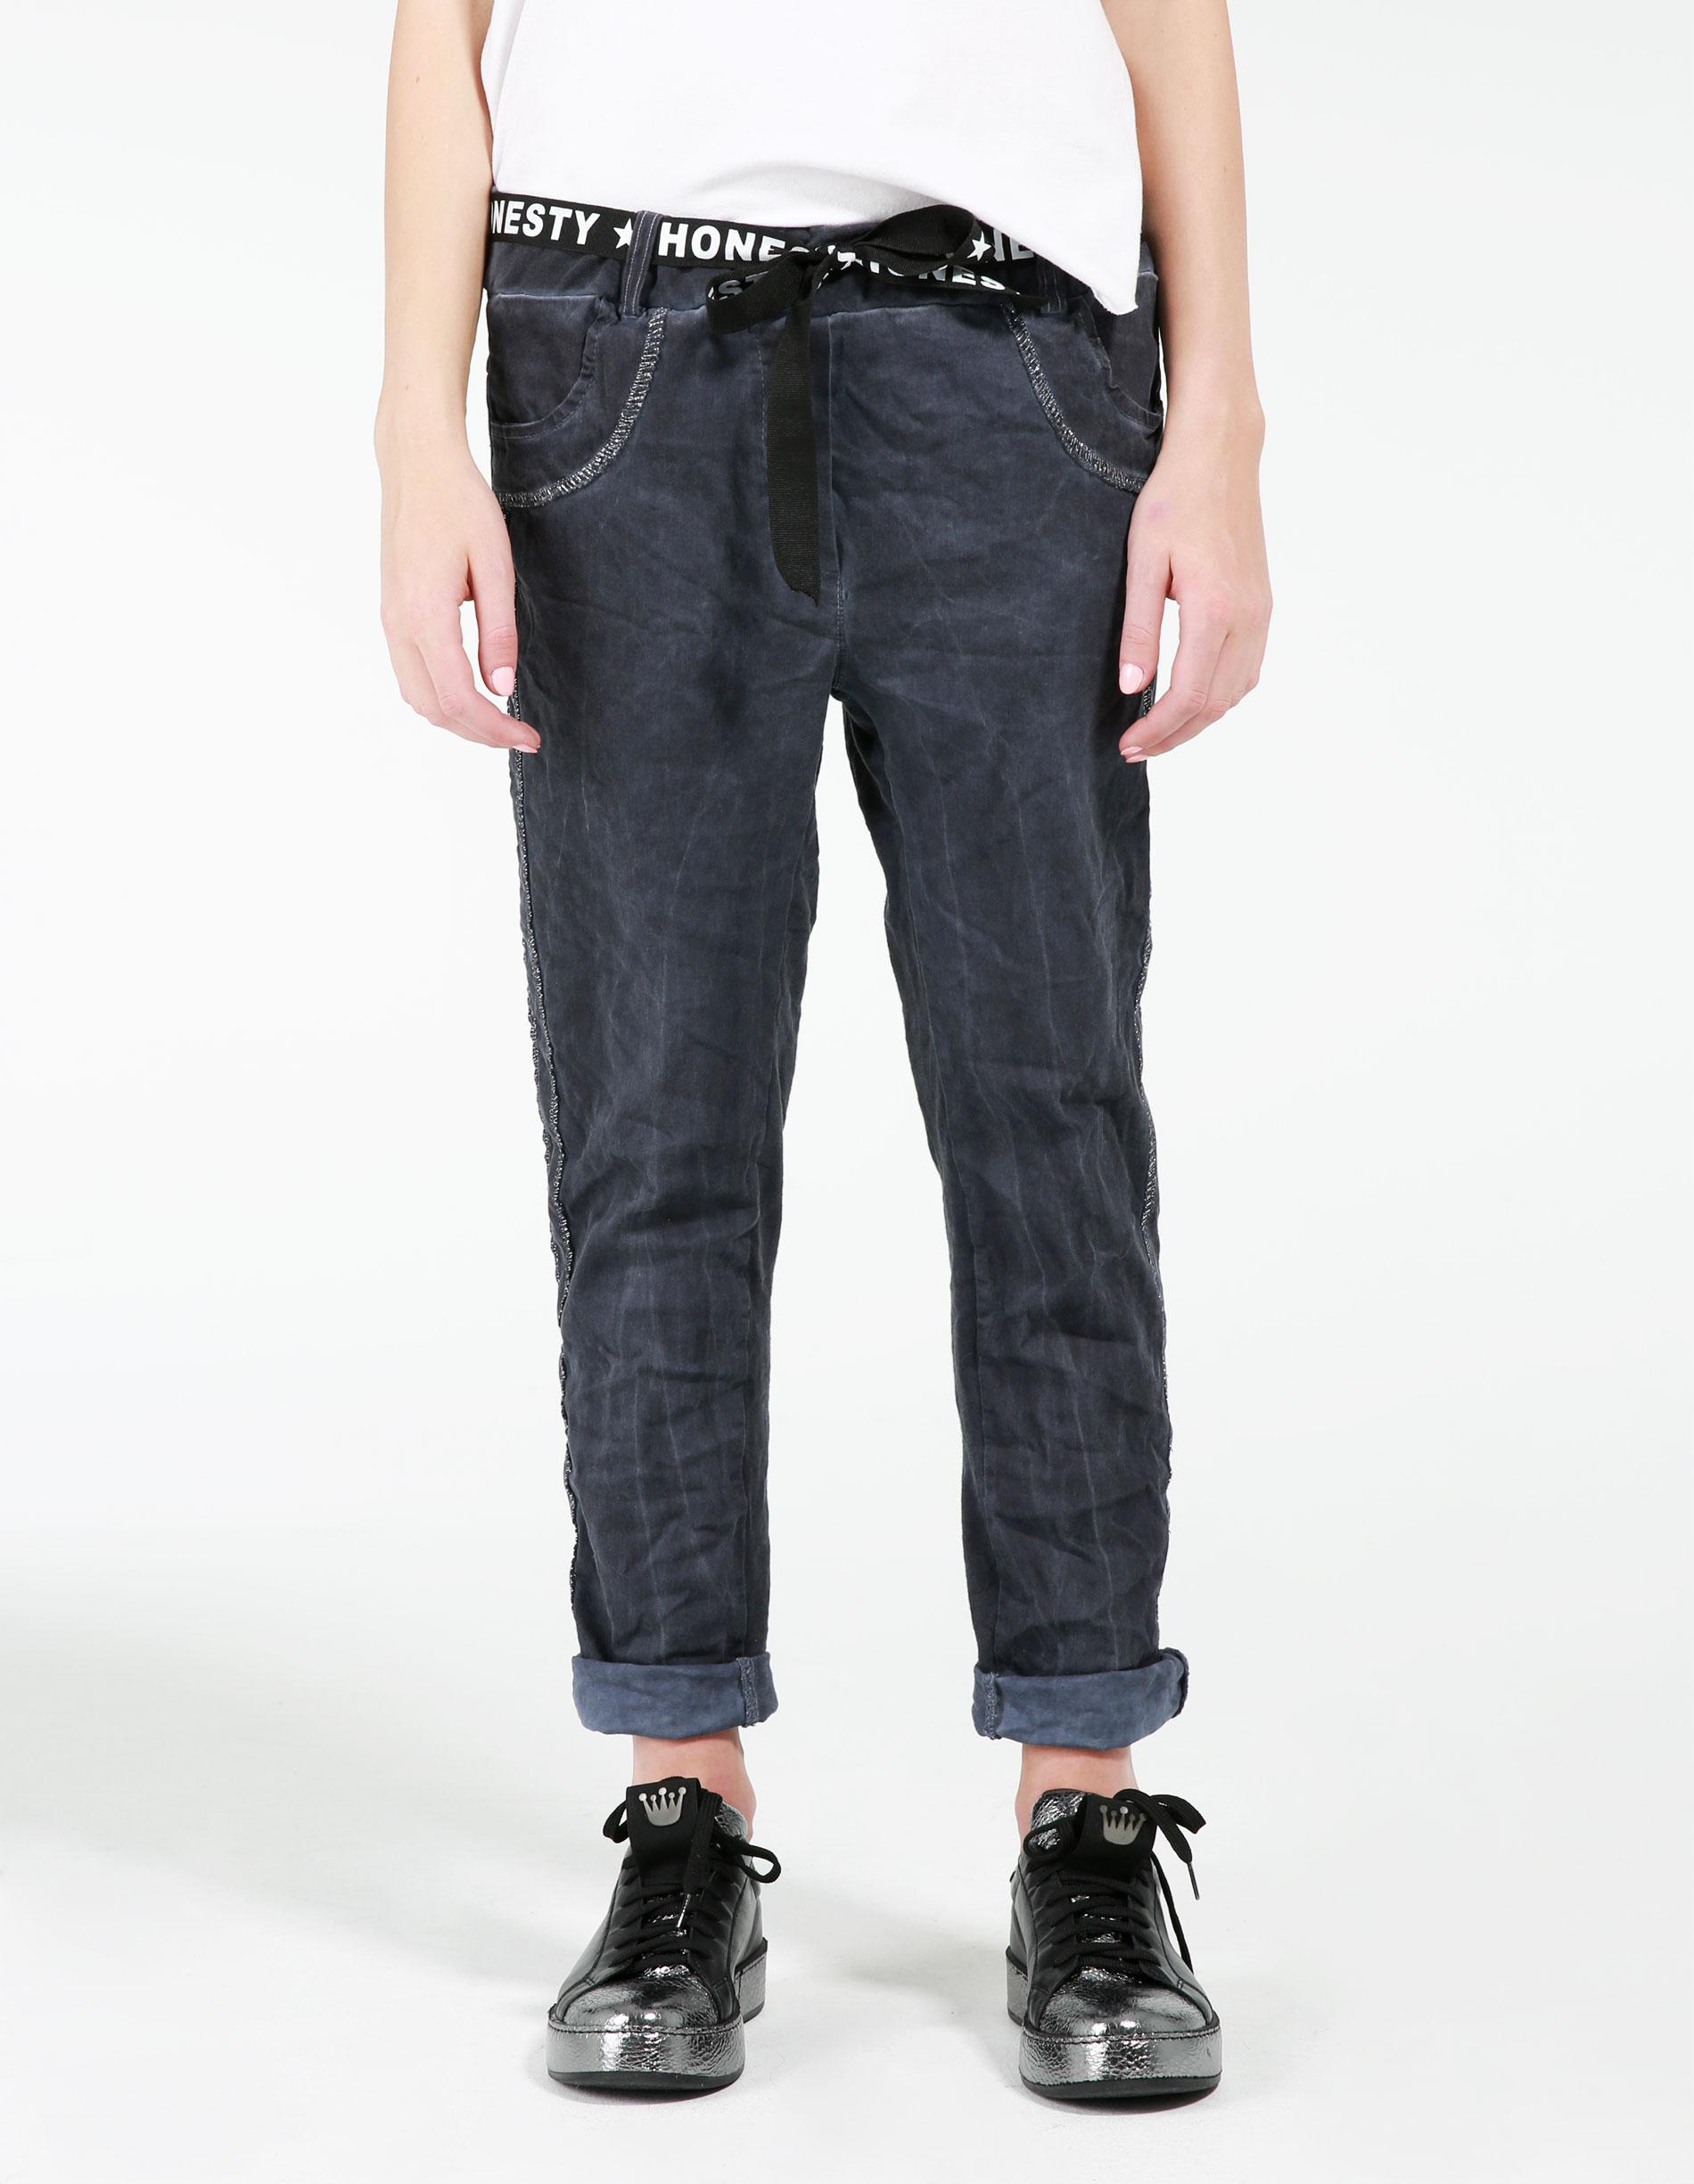 Spodnie - 137-33590 BLS - Unisono